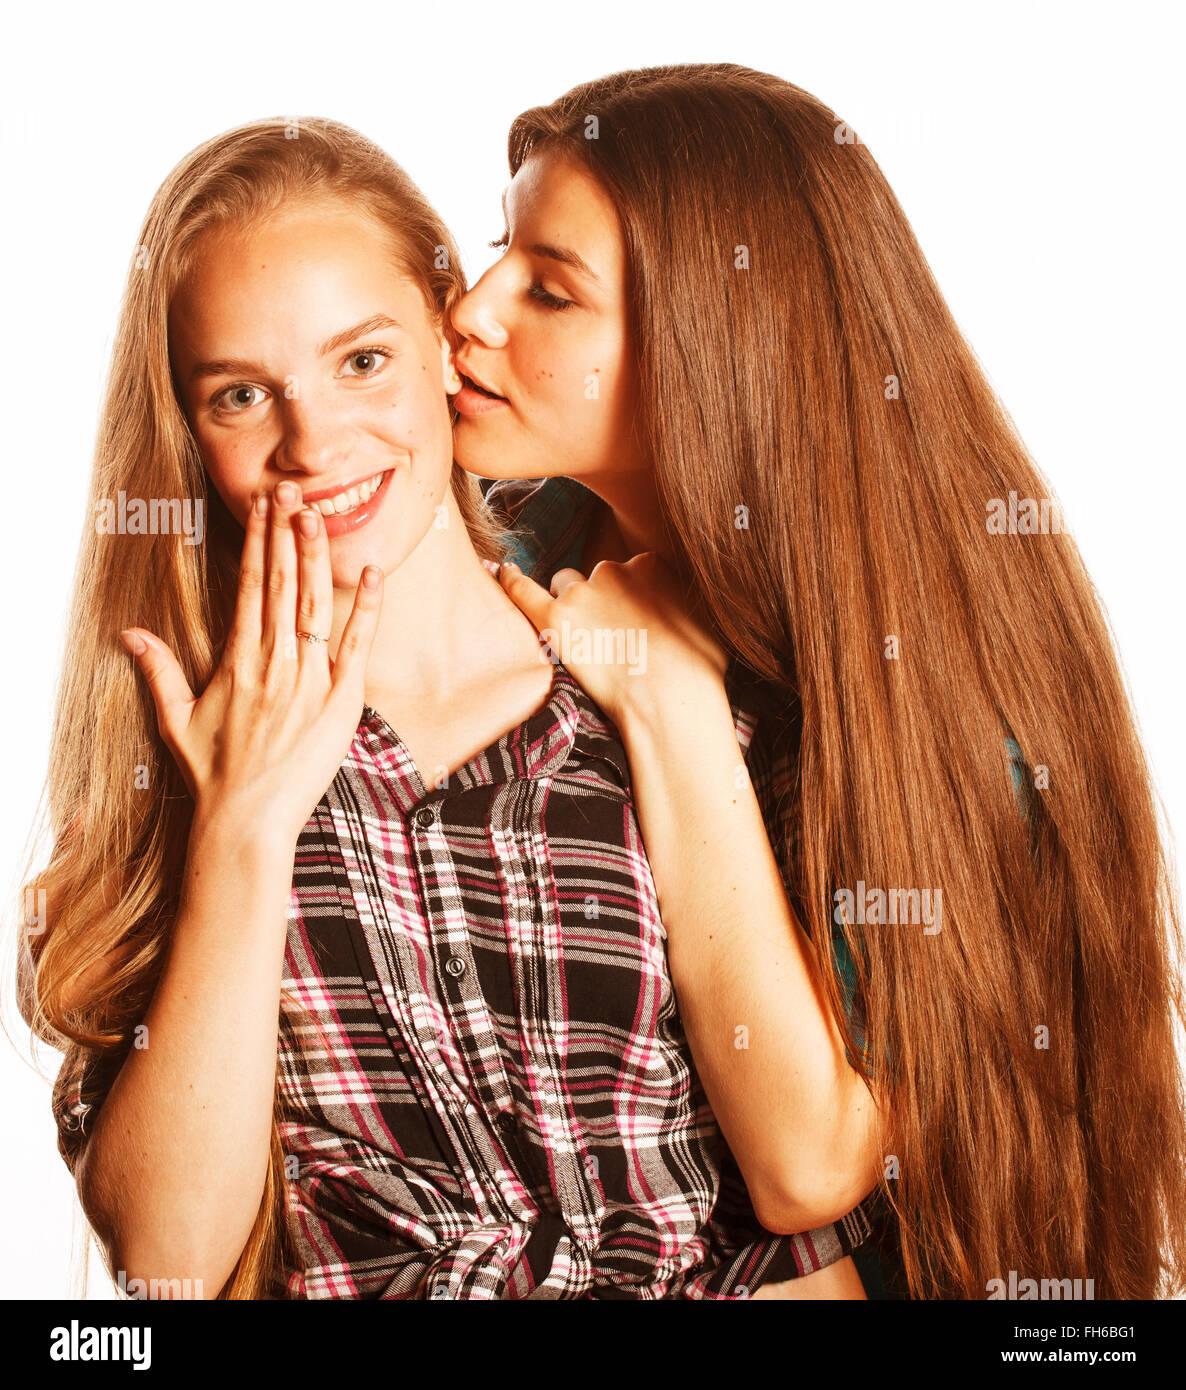 Two cute teens kissing